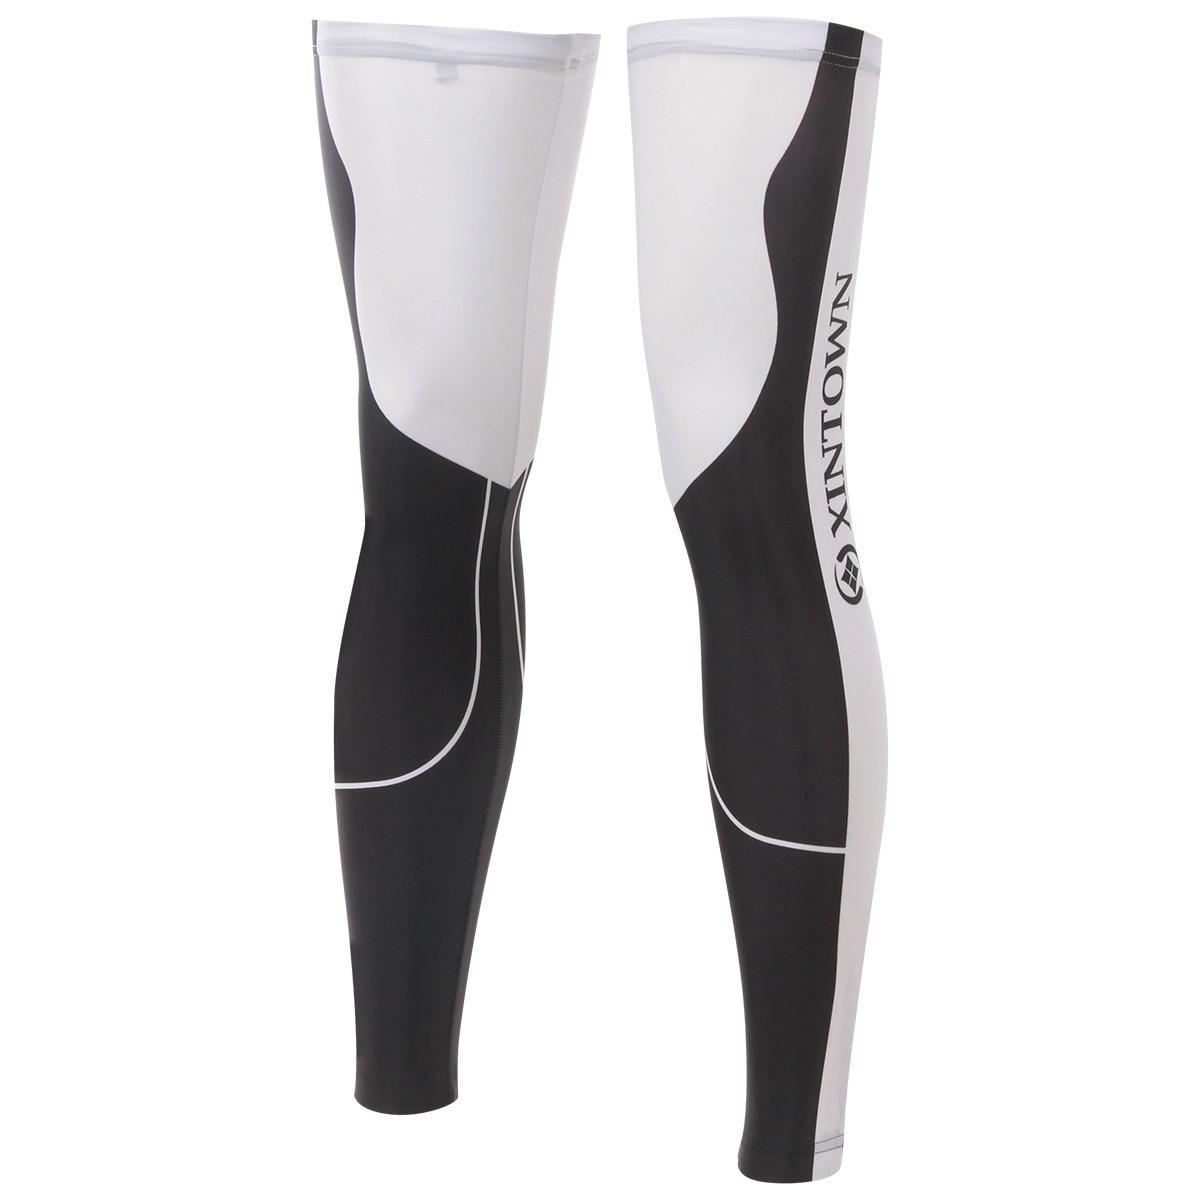 BOODUN Loong As White Riding Leg Set Cycling Outdoors Sunscreen Leg Set Bicycle Motion Defence Leggings Set